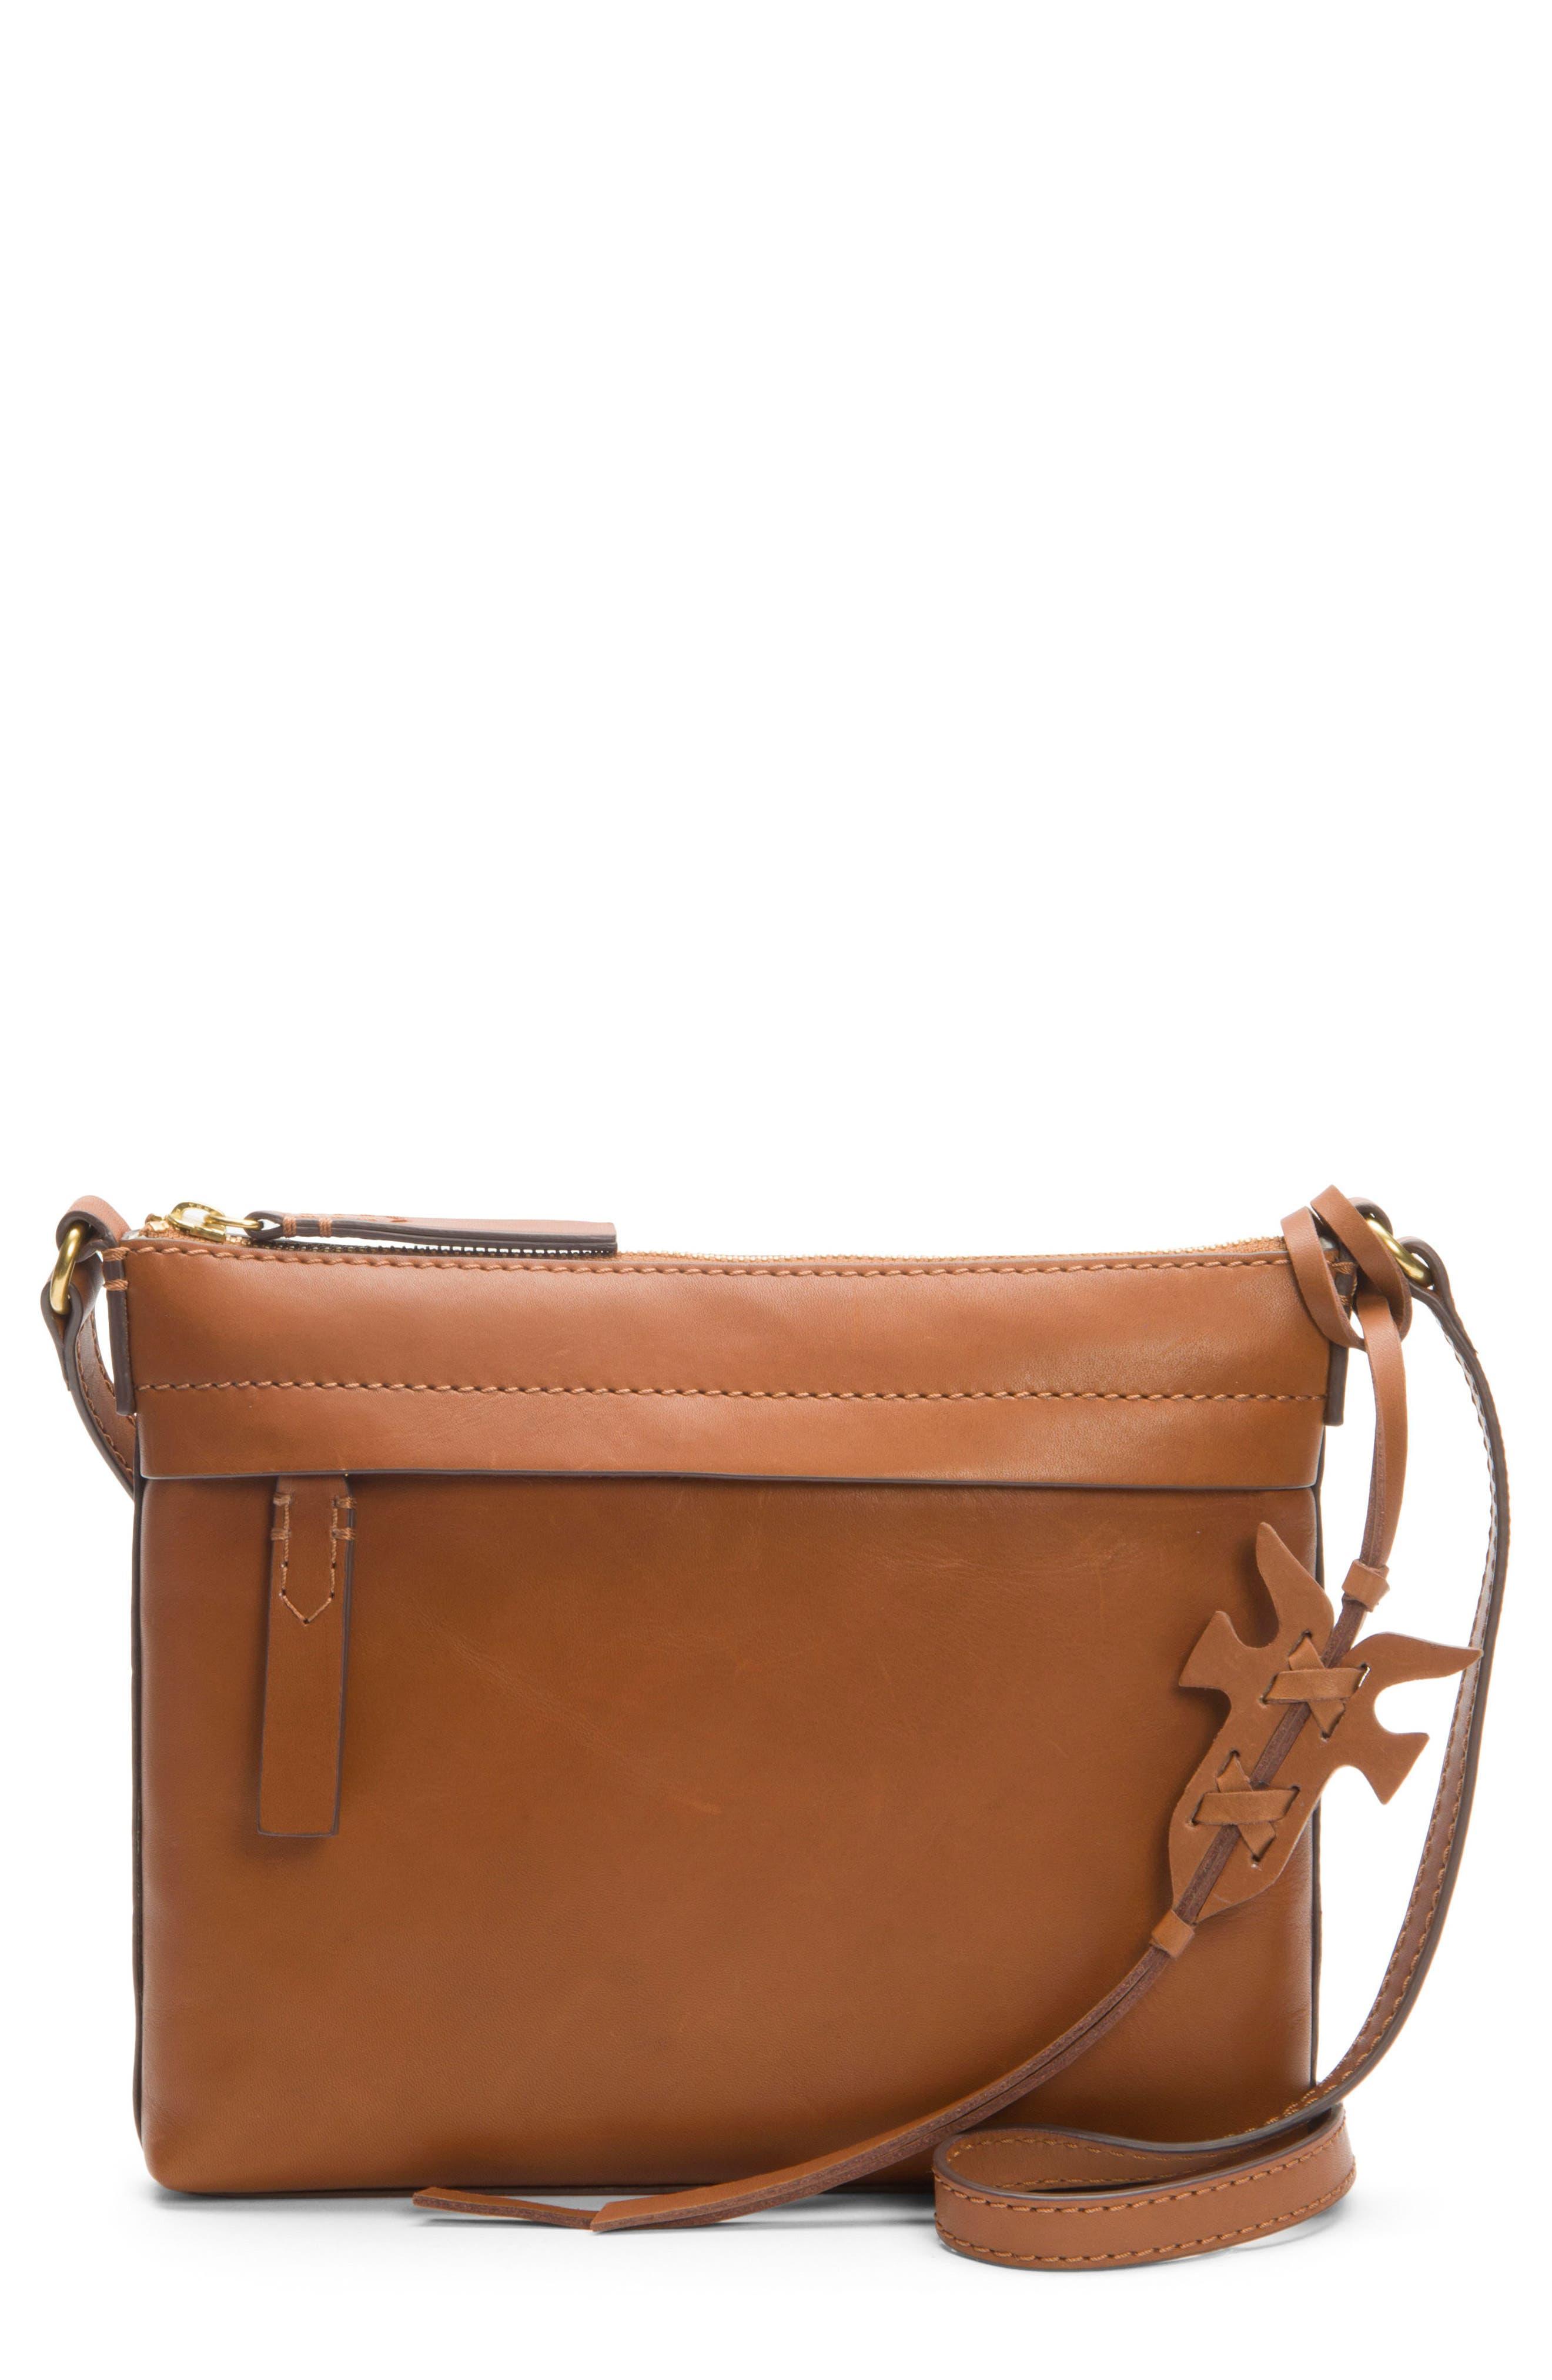 Carson Leather Crossbody Bag,                             Main thumbnail 1, color,                             COGNAC